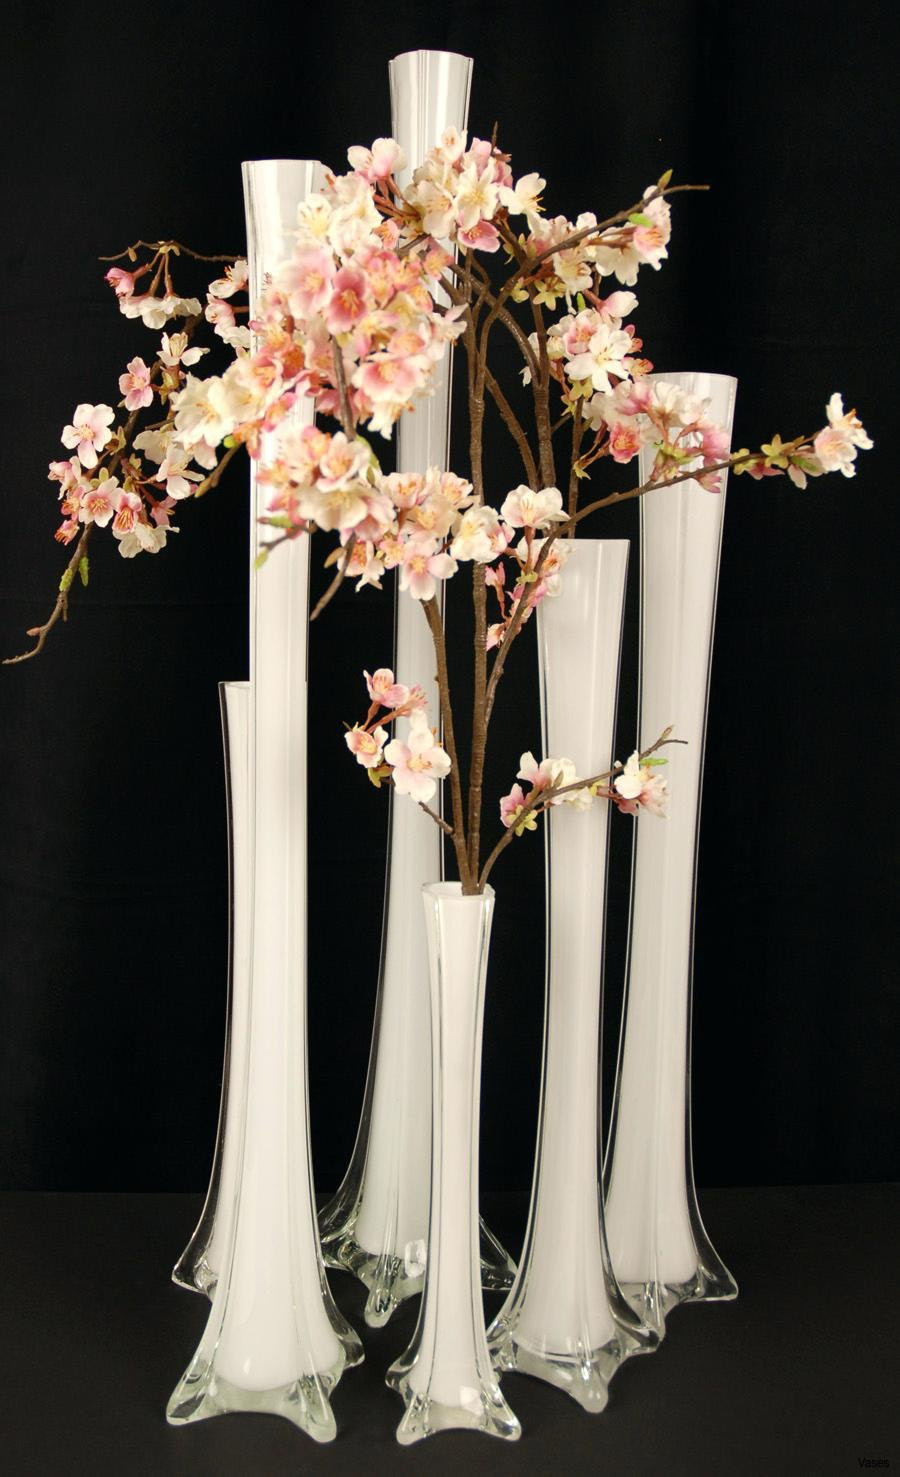 paper vase craft of black eiffel tower vases image vases plastic tower eiffel vase 31 pertaining to black eiffel tower vases image vases plastic tower eiffel vase 31 25in frostedi 0d with led light